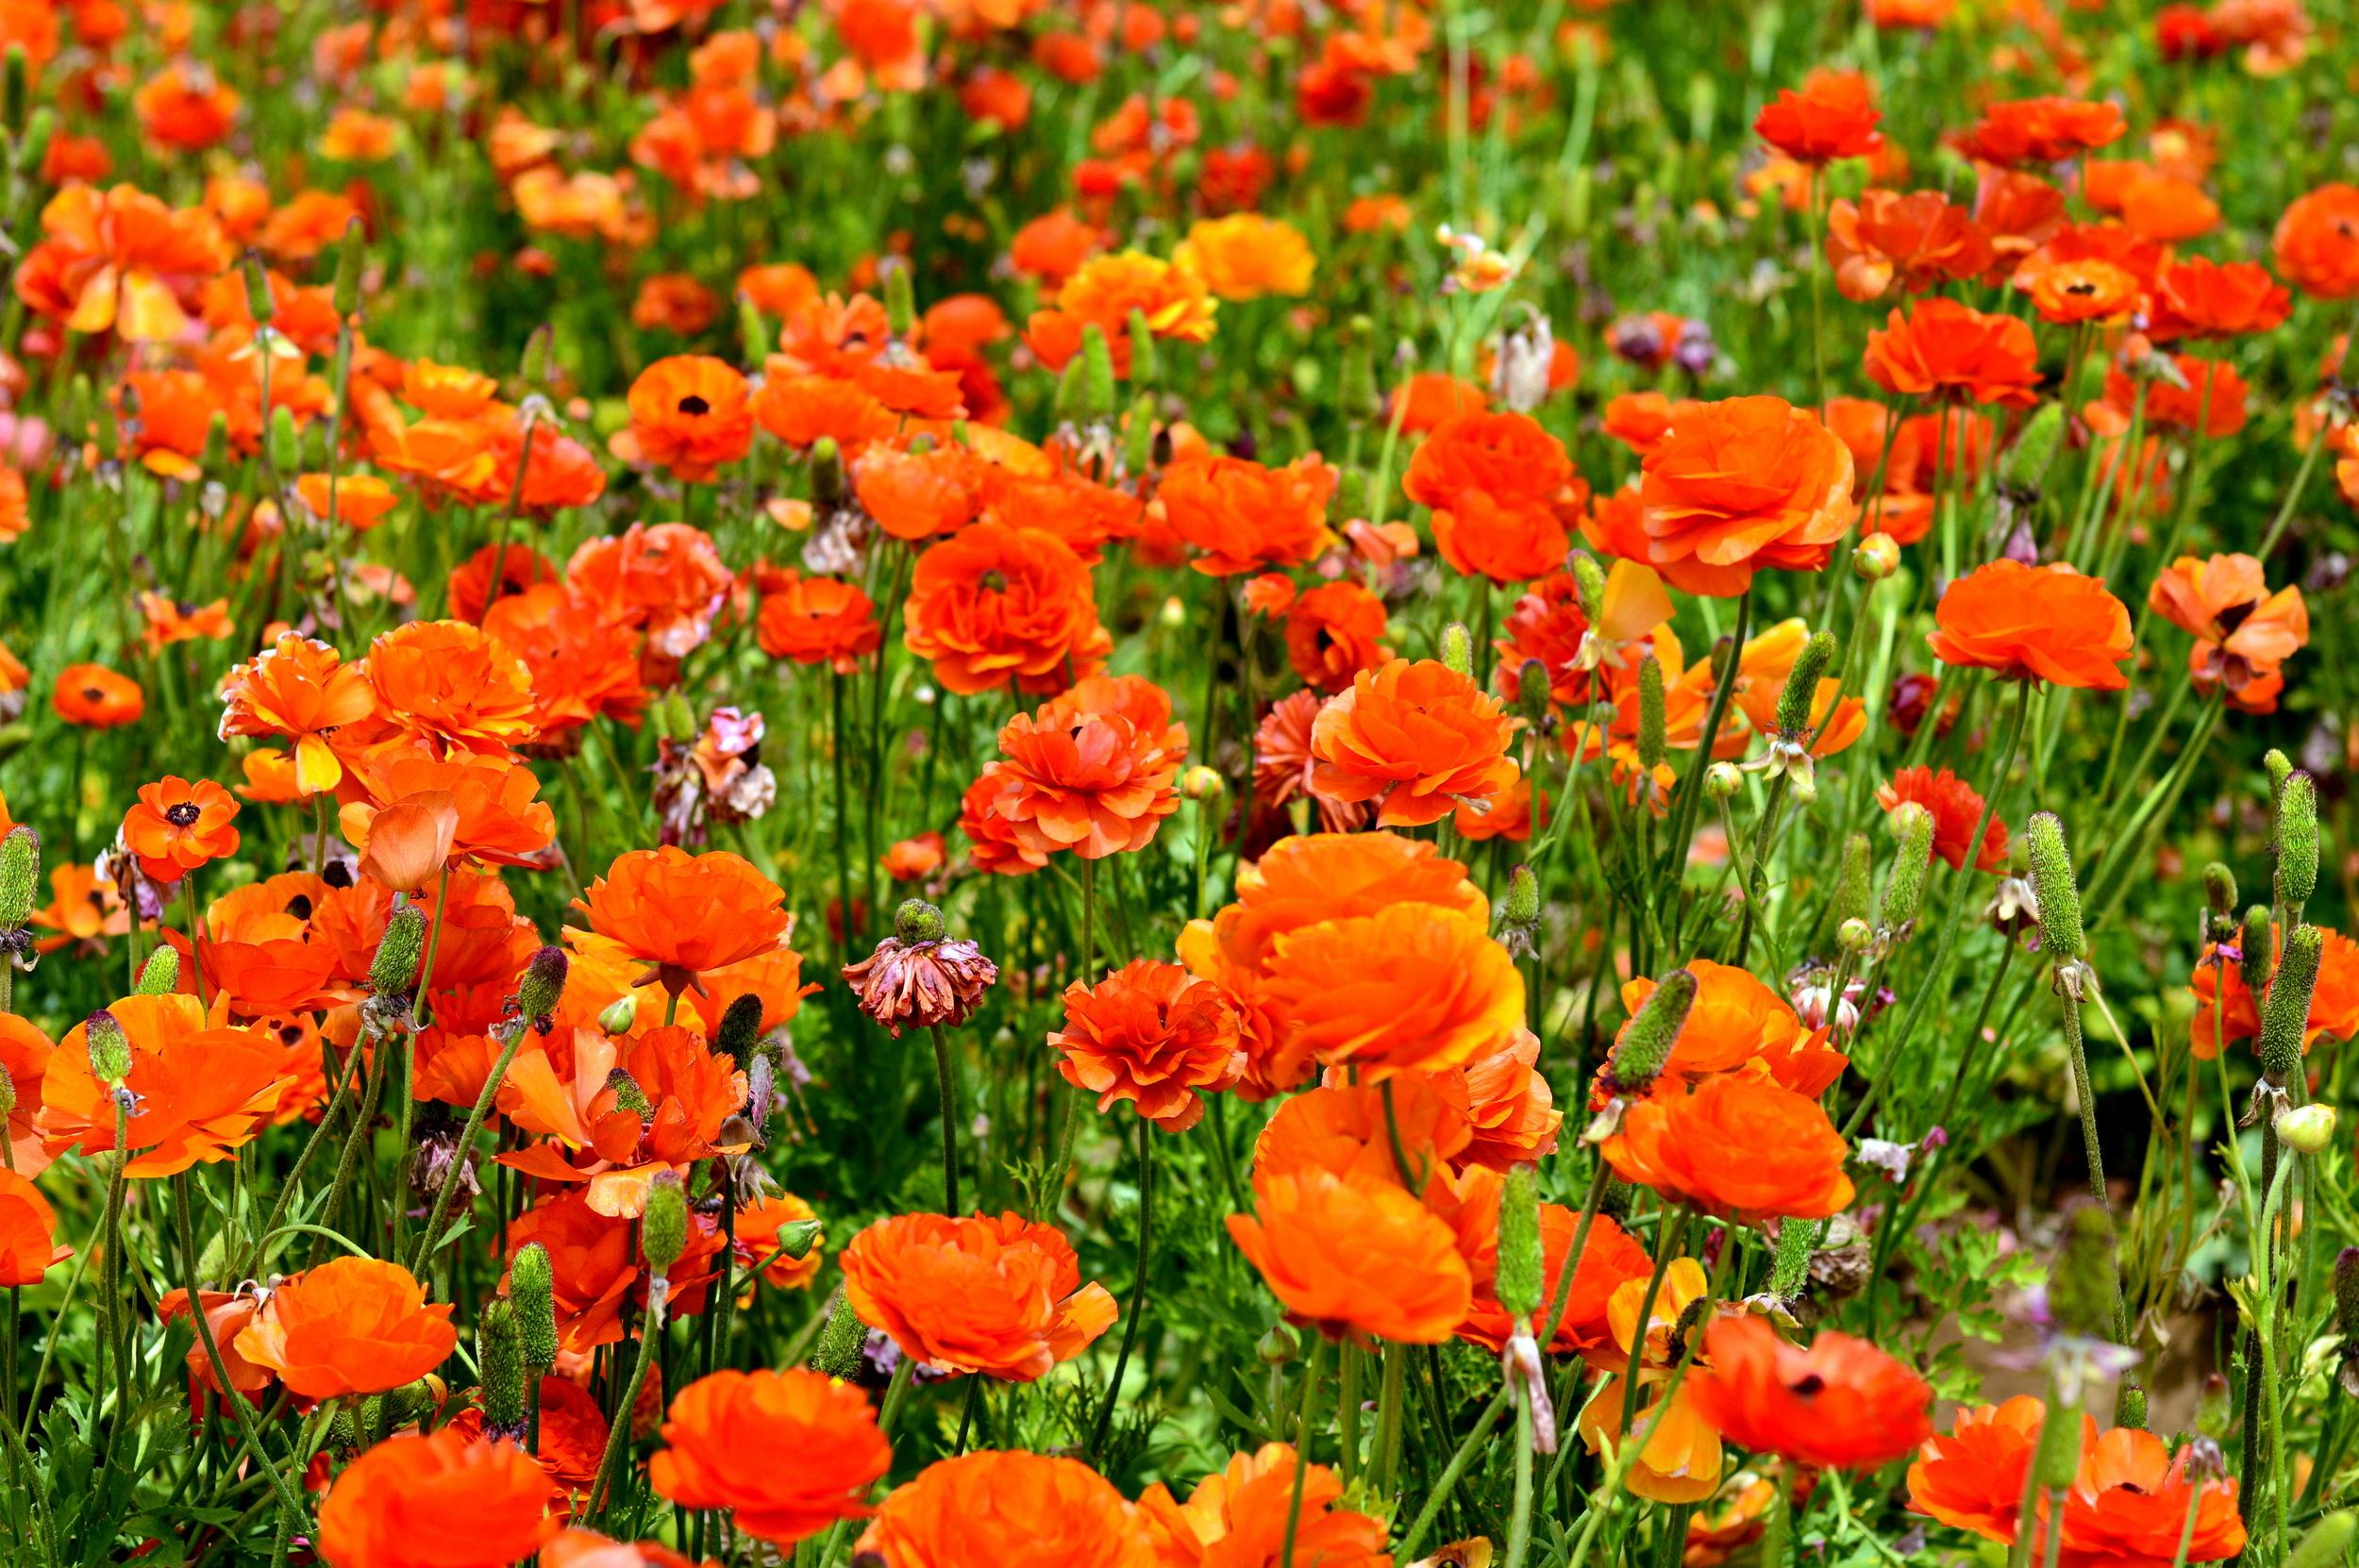 carlsbad-san-diego-flower-fields-travel-blogger 2